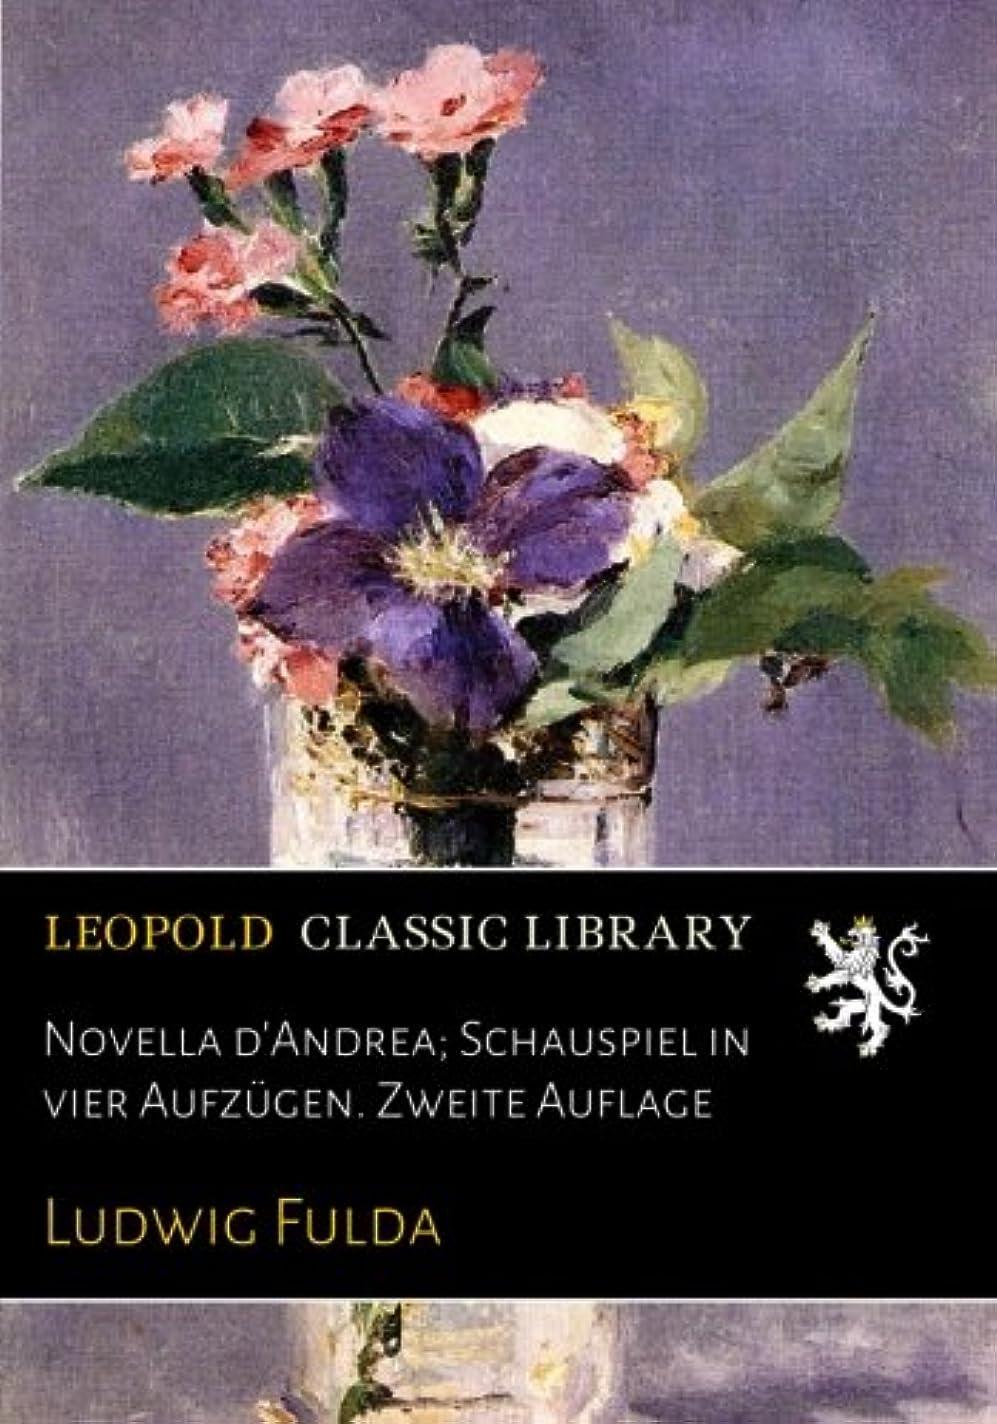 靄人柄線Novella d'Andrea; Schauspiel in vier Aufzuegen. Zweite Auflage